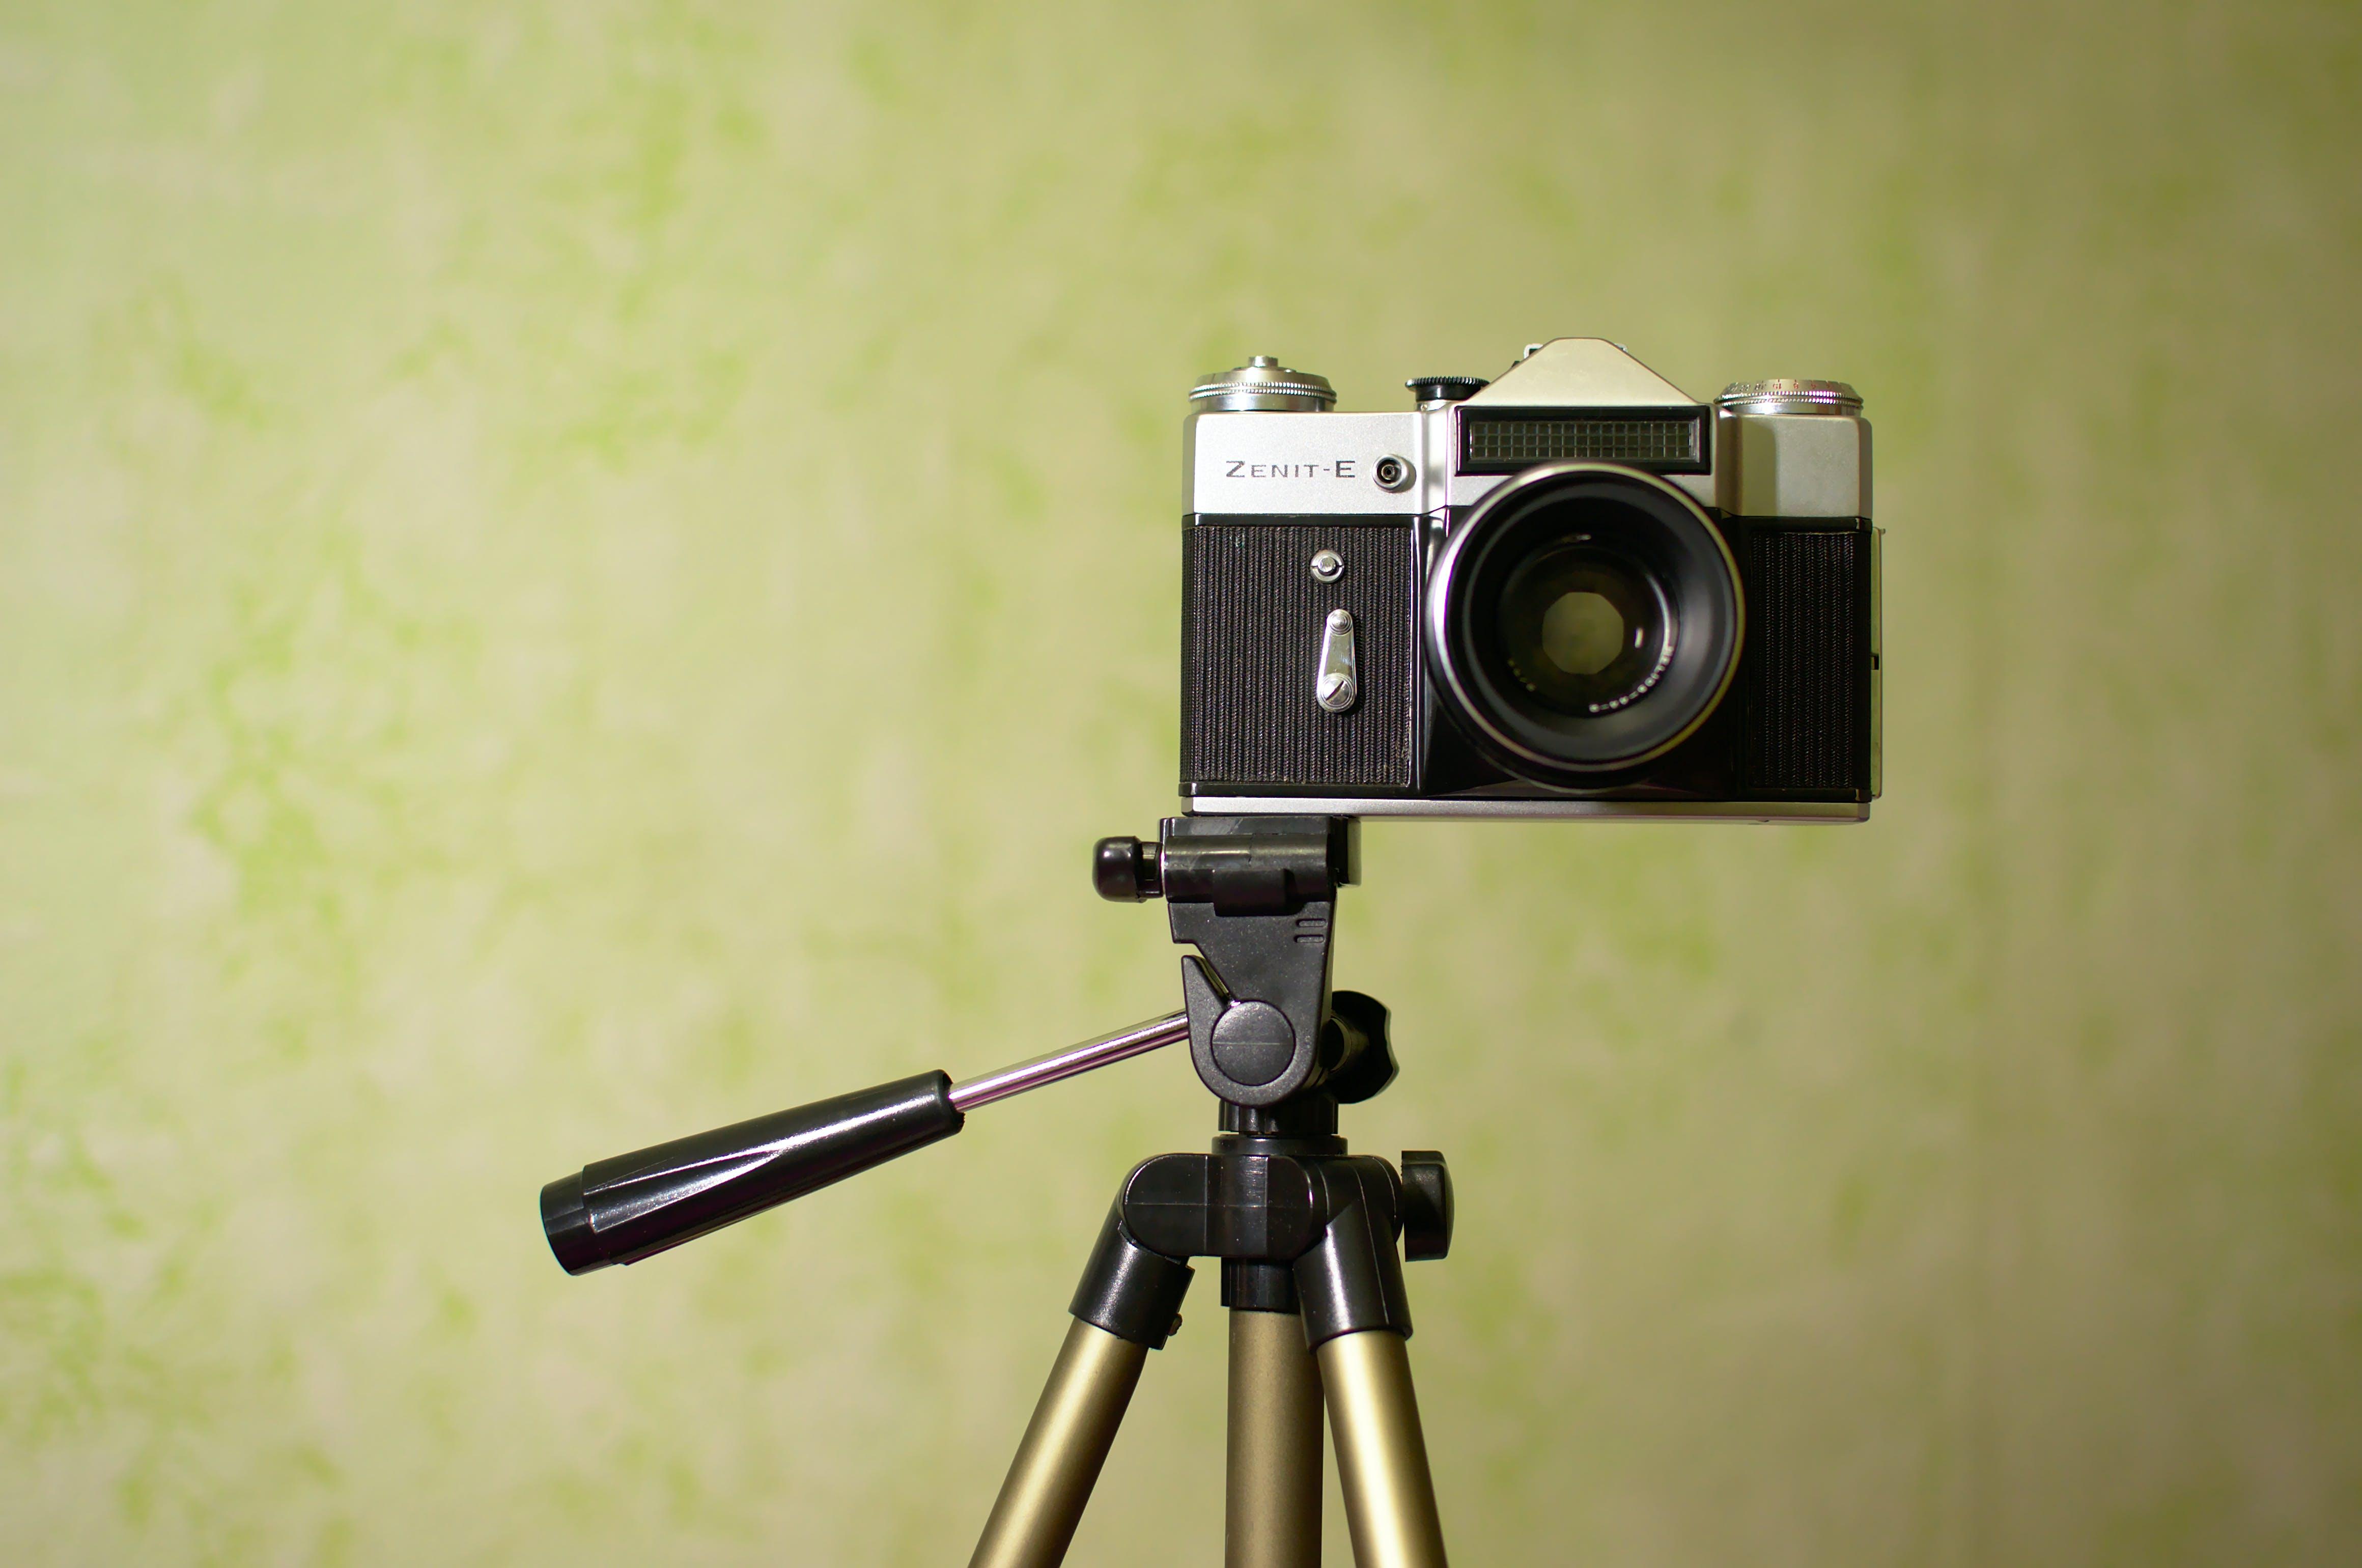 Free stock photo of camera, photography, vintage, technology